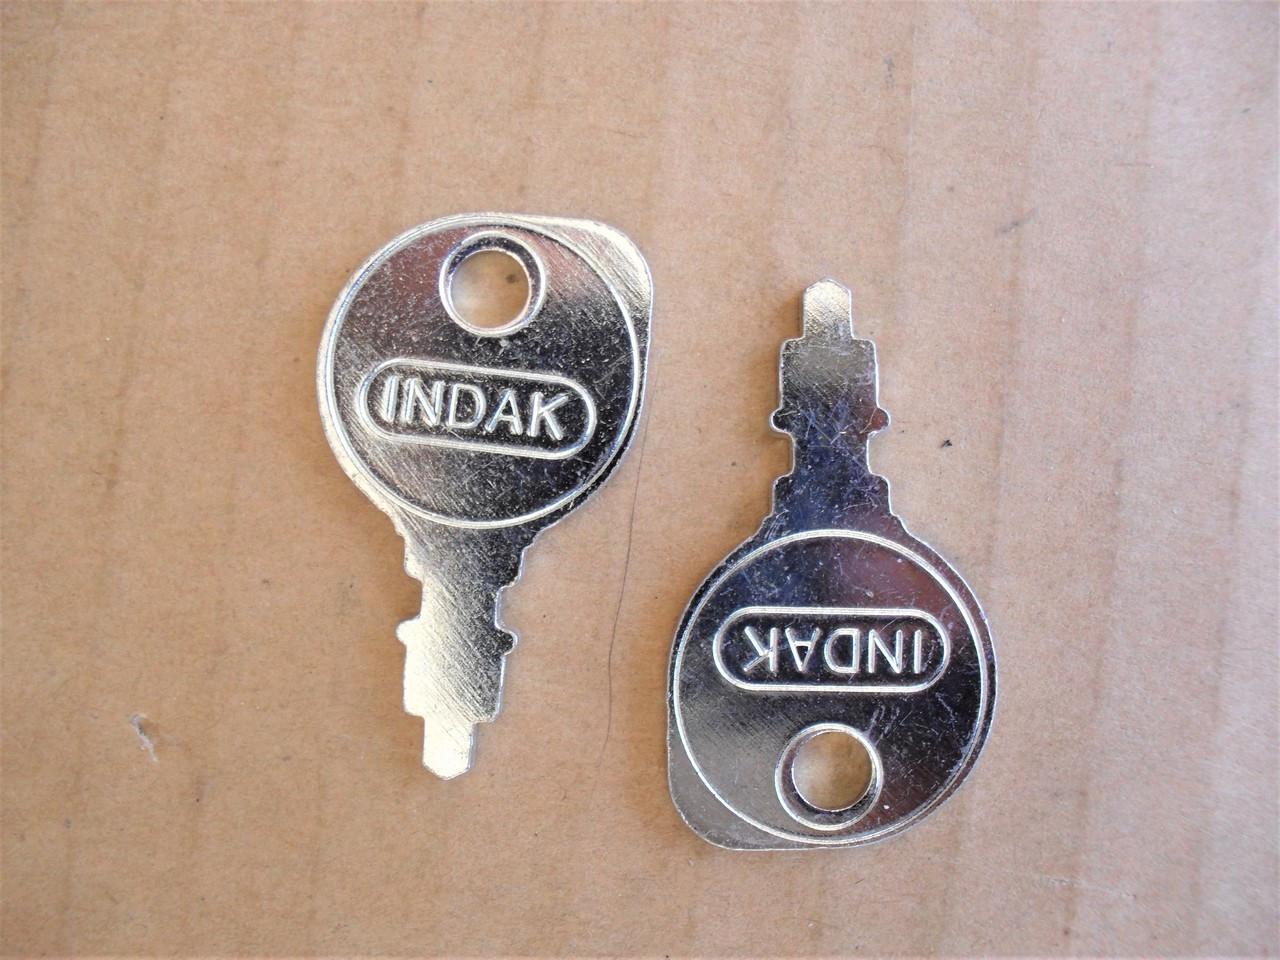 Indak Ignition Starter Switch Keys for MTD 725-0201, 925-0201 key